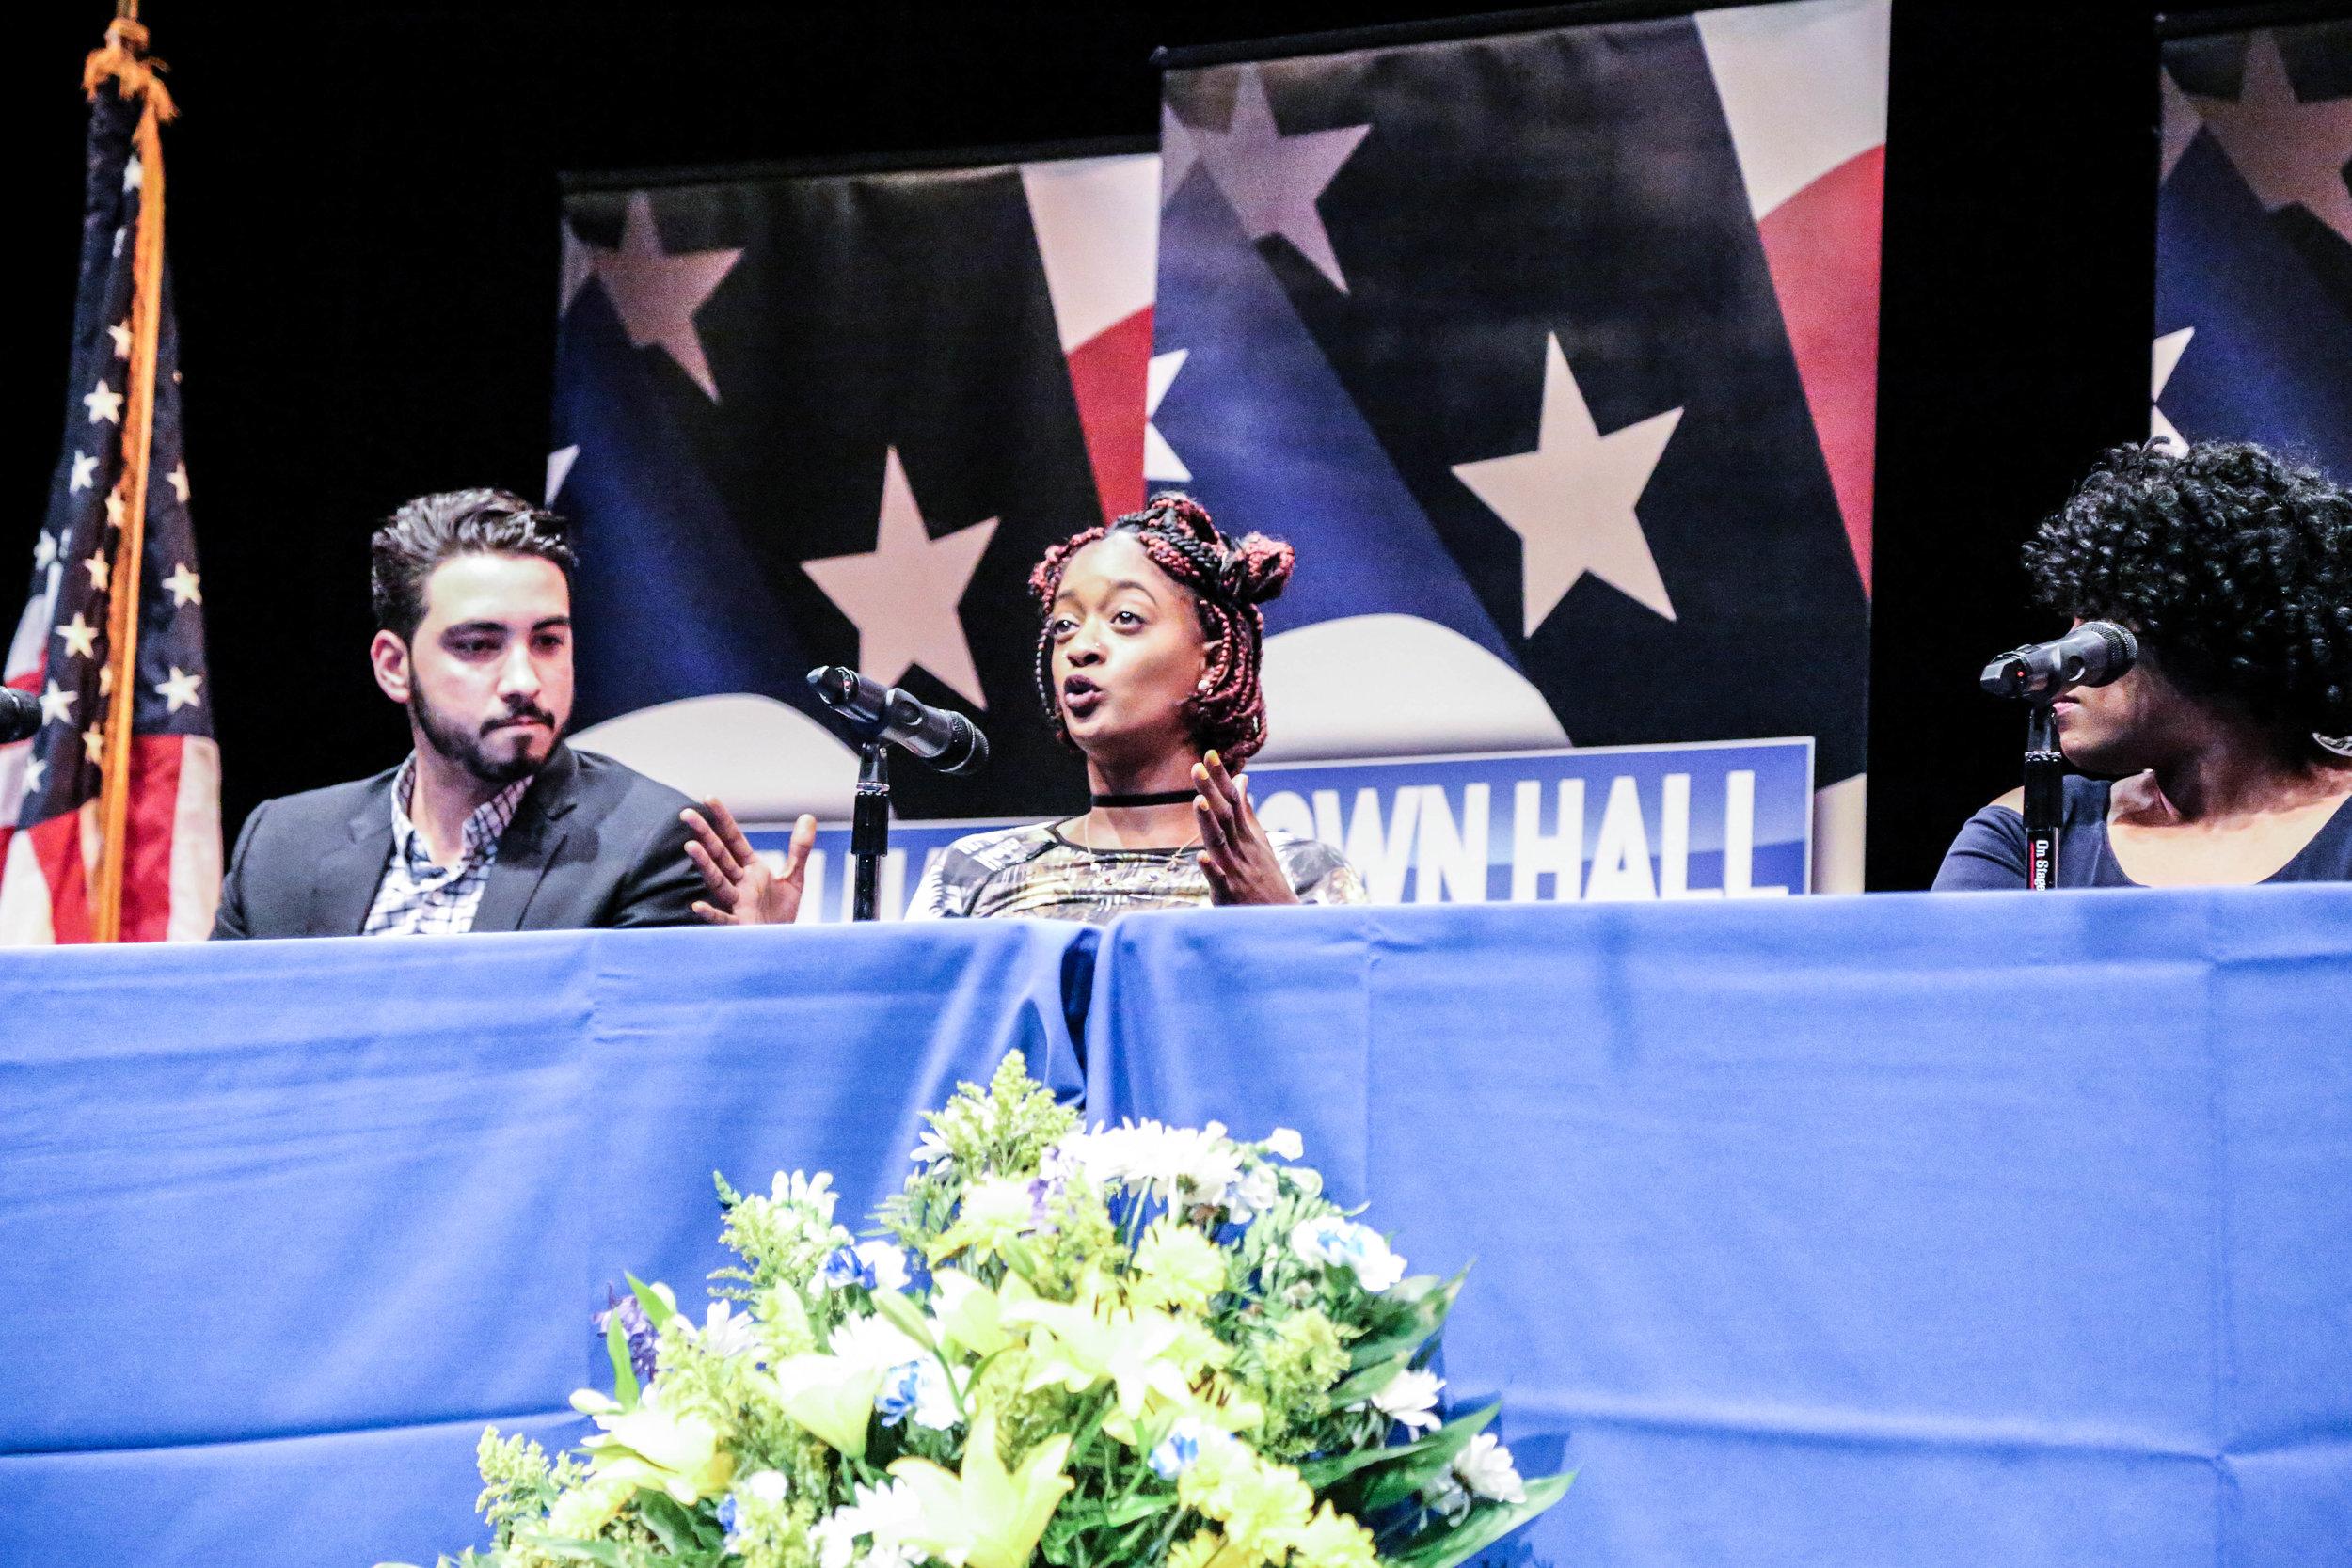 Howard Townhall 6|12|17-28.jpg